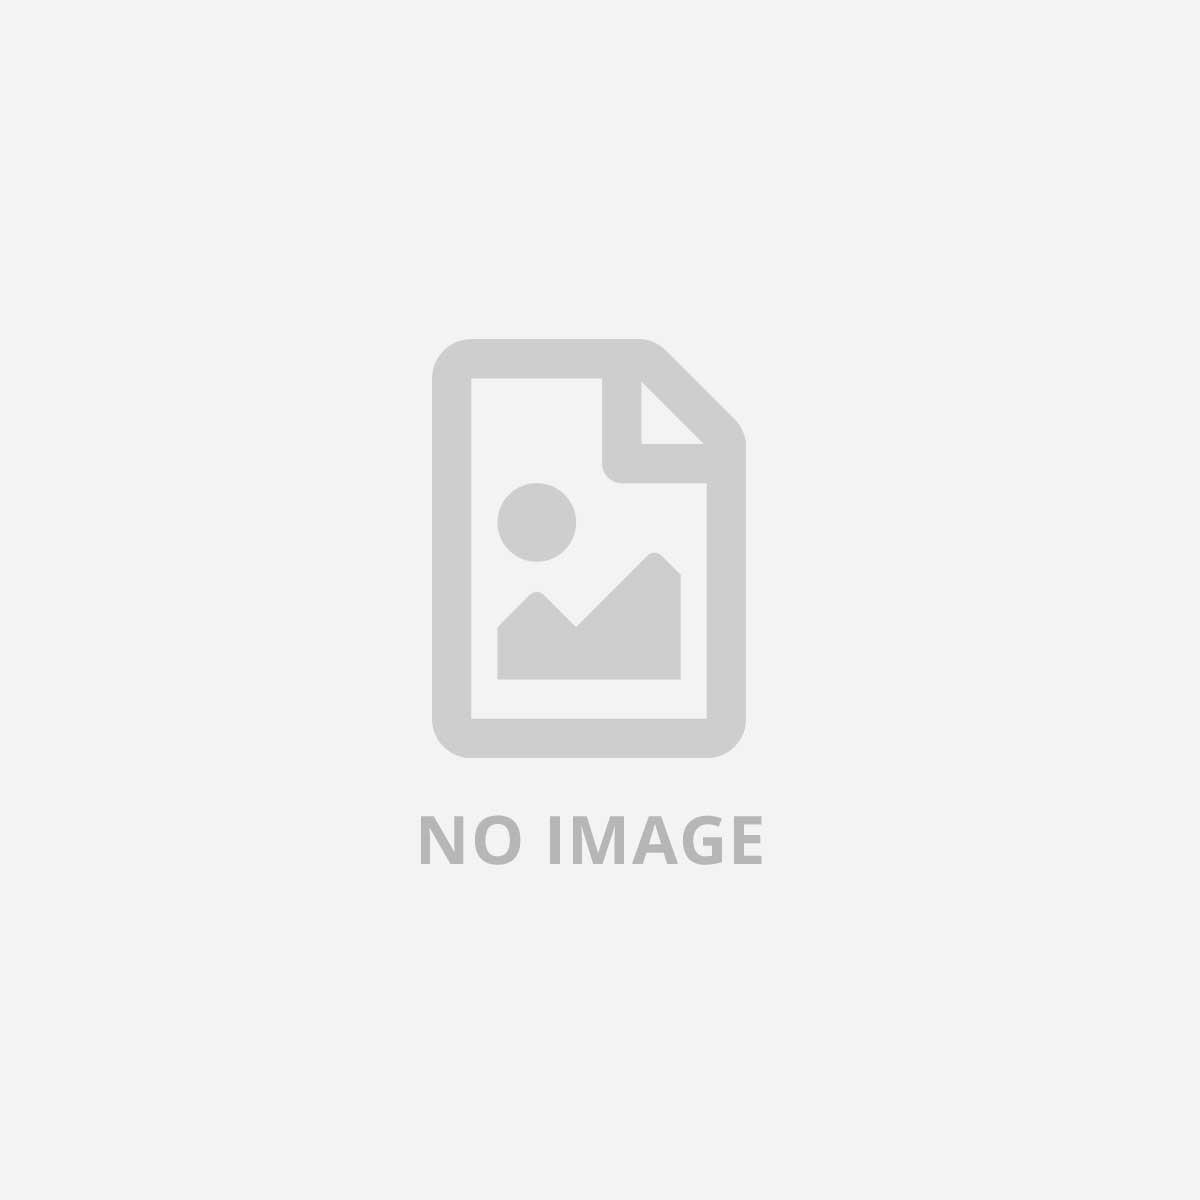 SITECOM USB 2.0 TRAVEL HUB 4 PORT